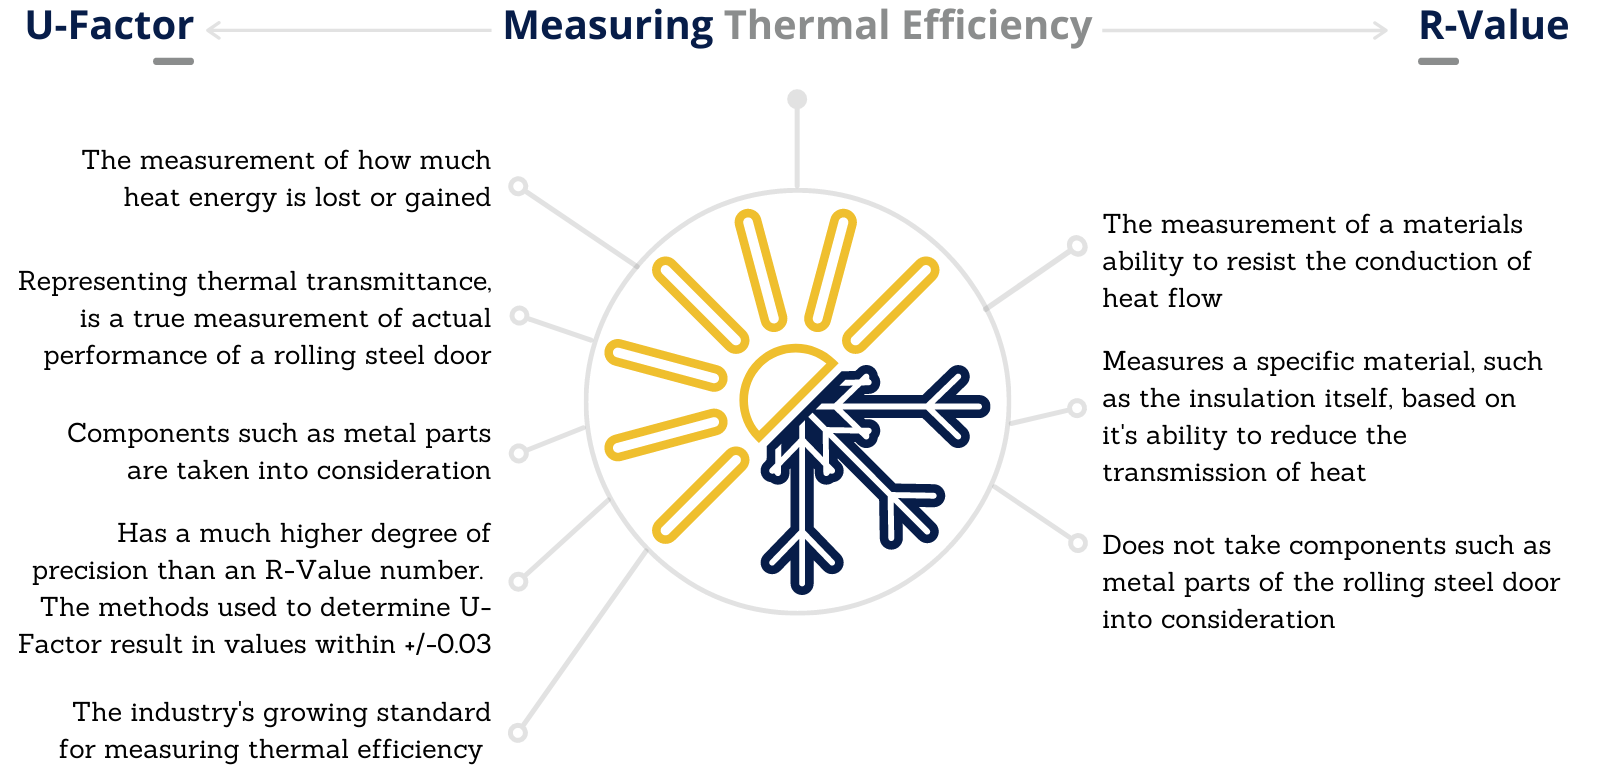 Comparison for Measuring Thermal Efficiency in Rolling Steel Doors